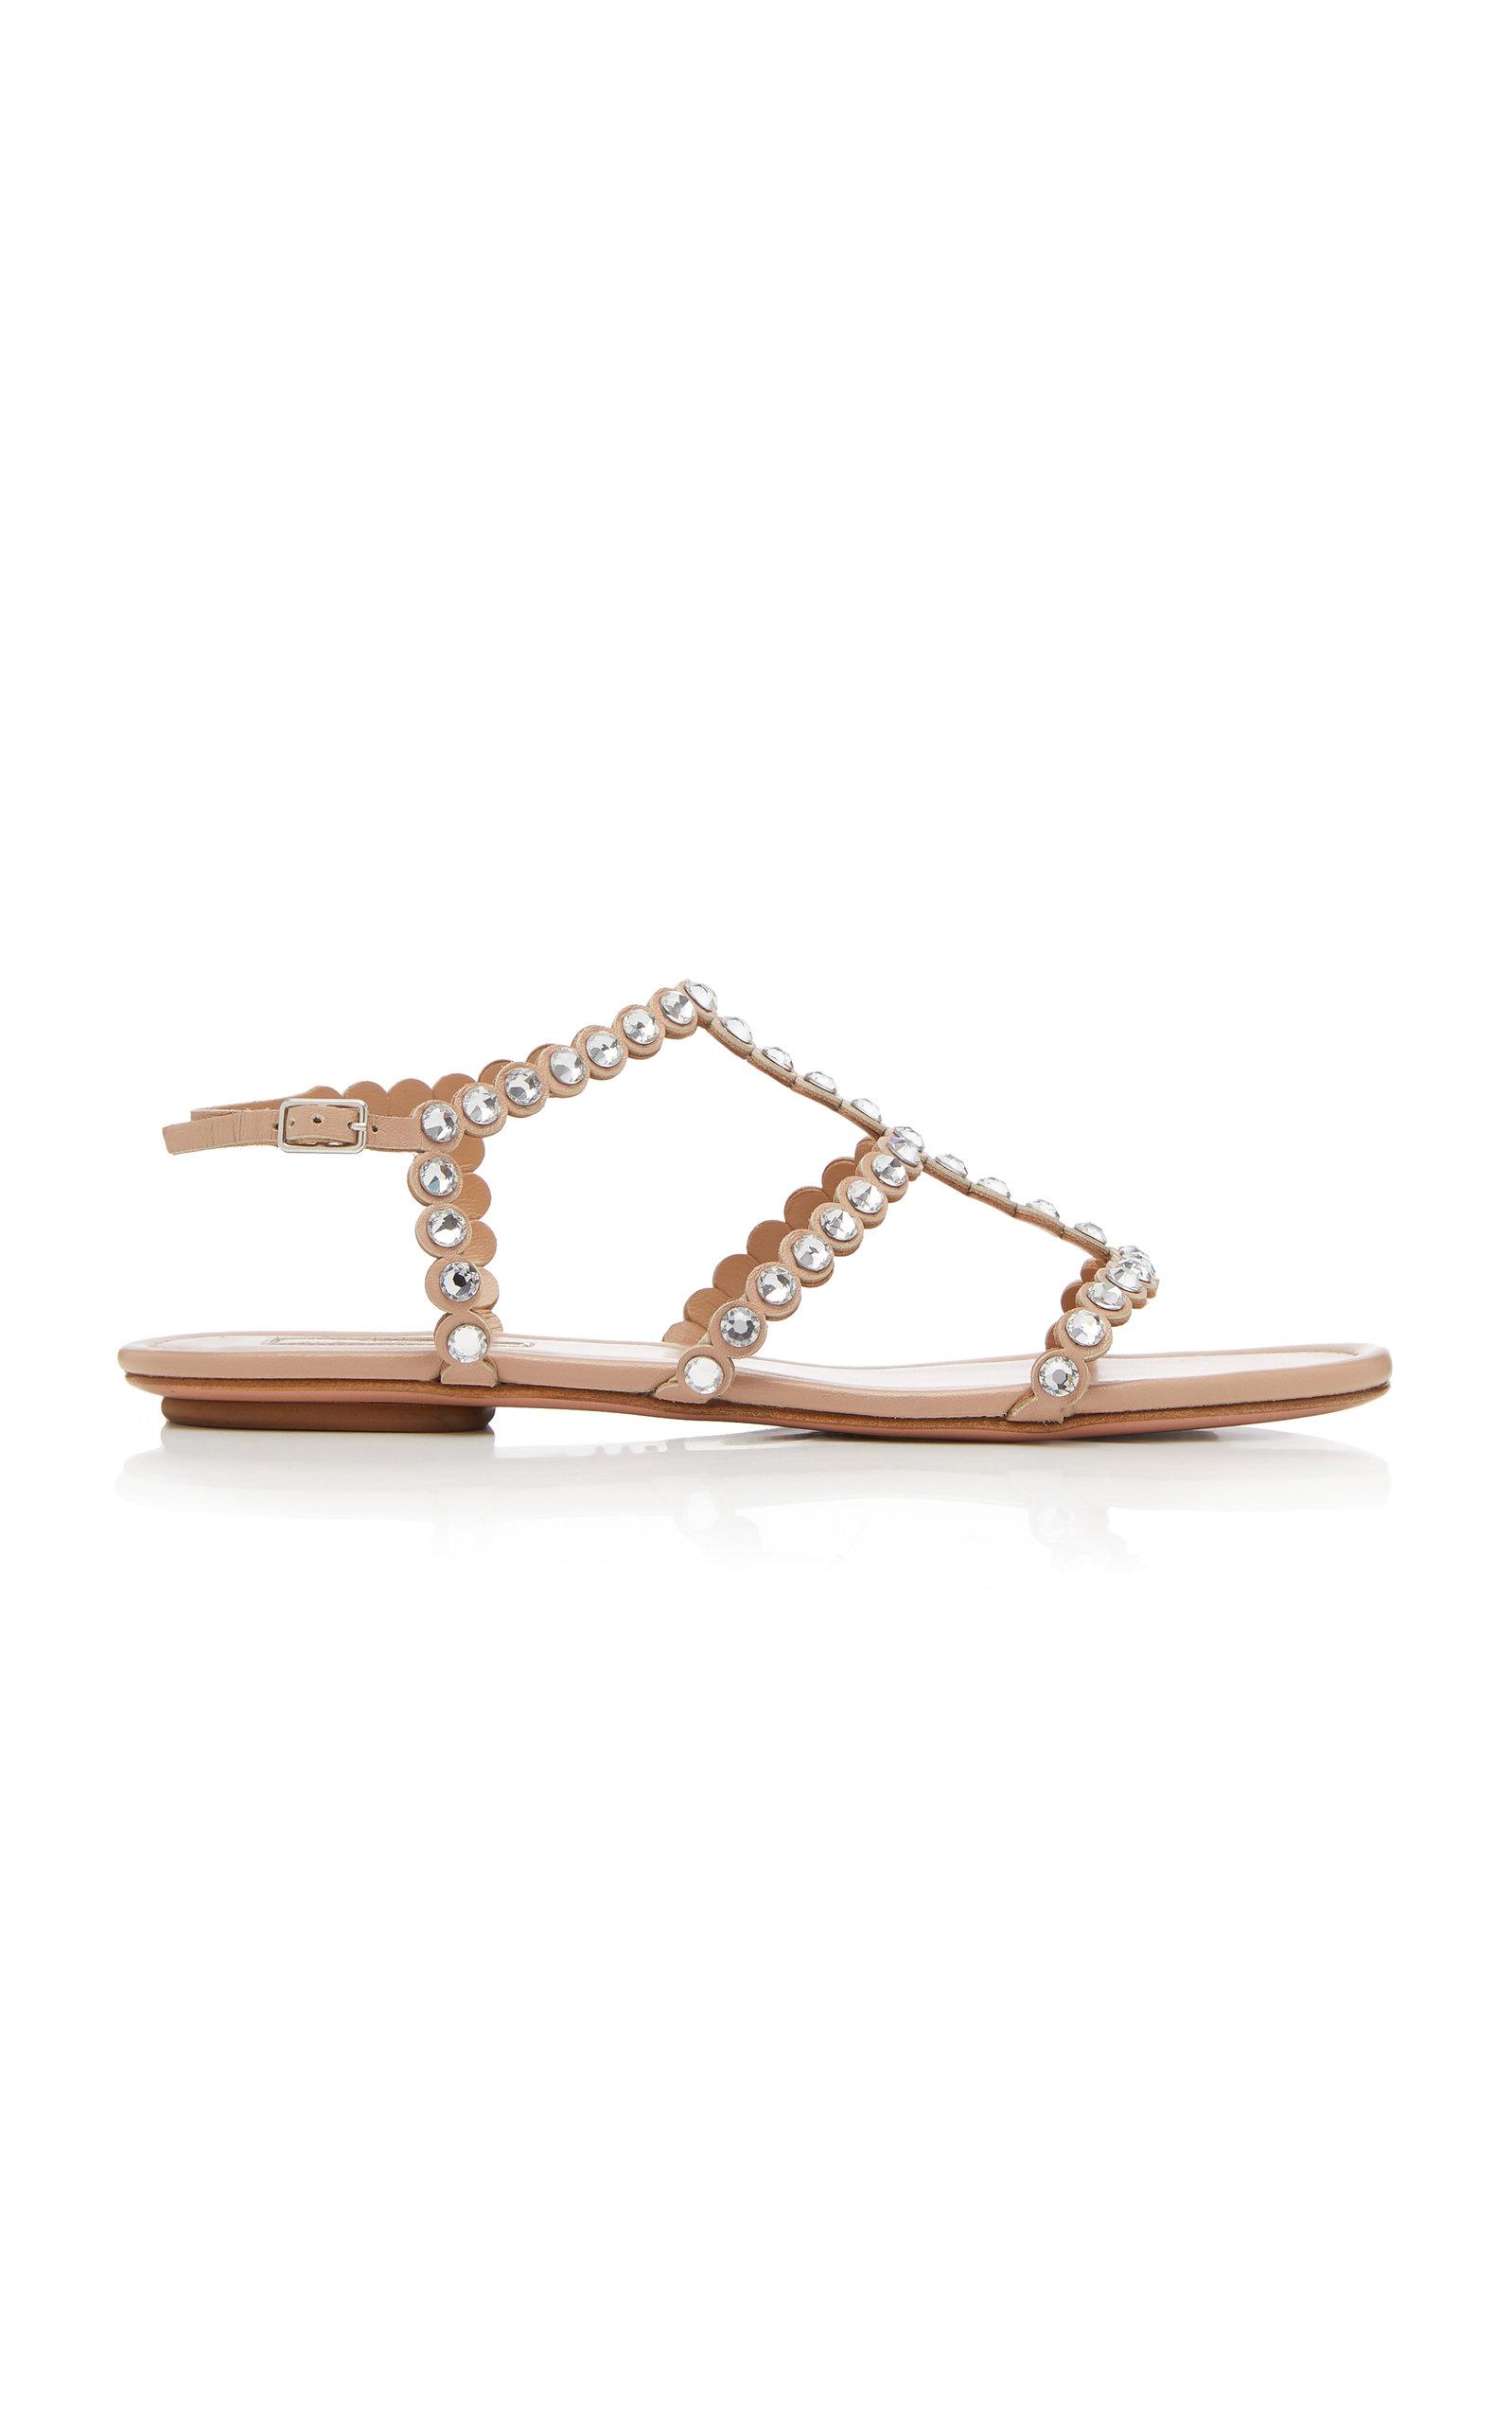 ee84c2c97 AquazzuraTequila Crystal-Embellished Leather Sandals. CLOSE. Loading